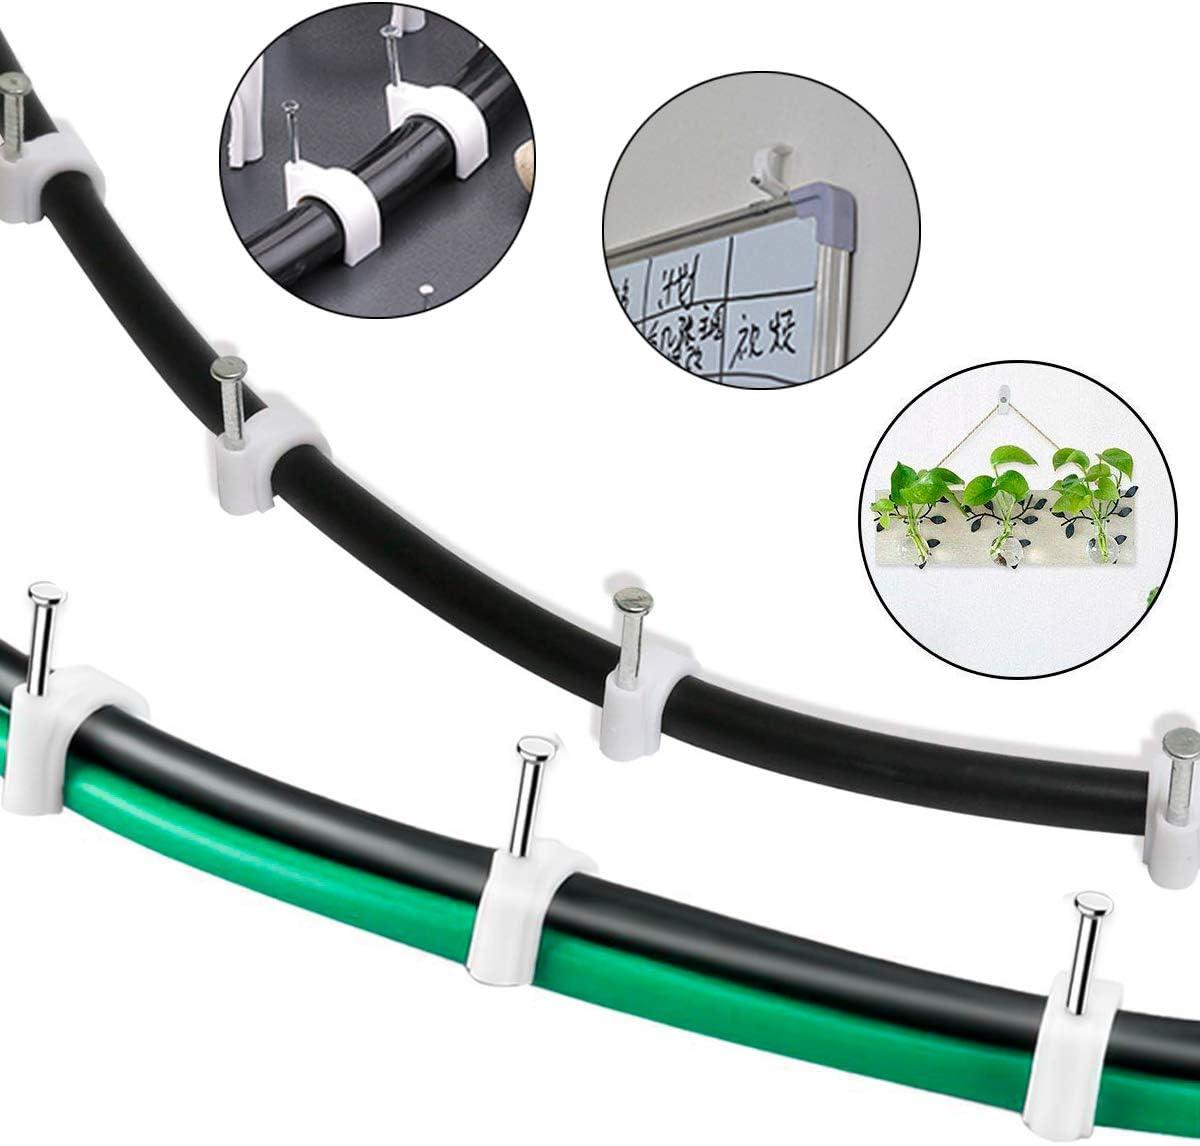 Fodlon Clips de Cable Redondo 400 Piezas Abrazadera para Cable Grapas para Cables con Clavos de Acero Incorporados Clips de pared de Cable Eléctrico ...